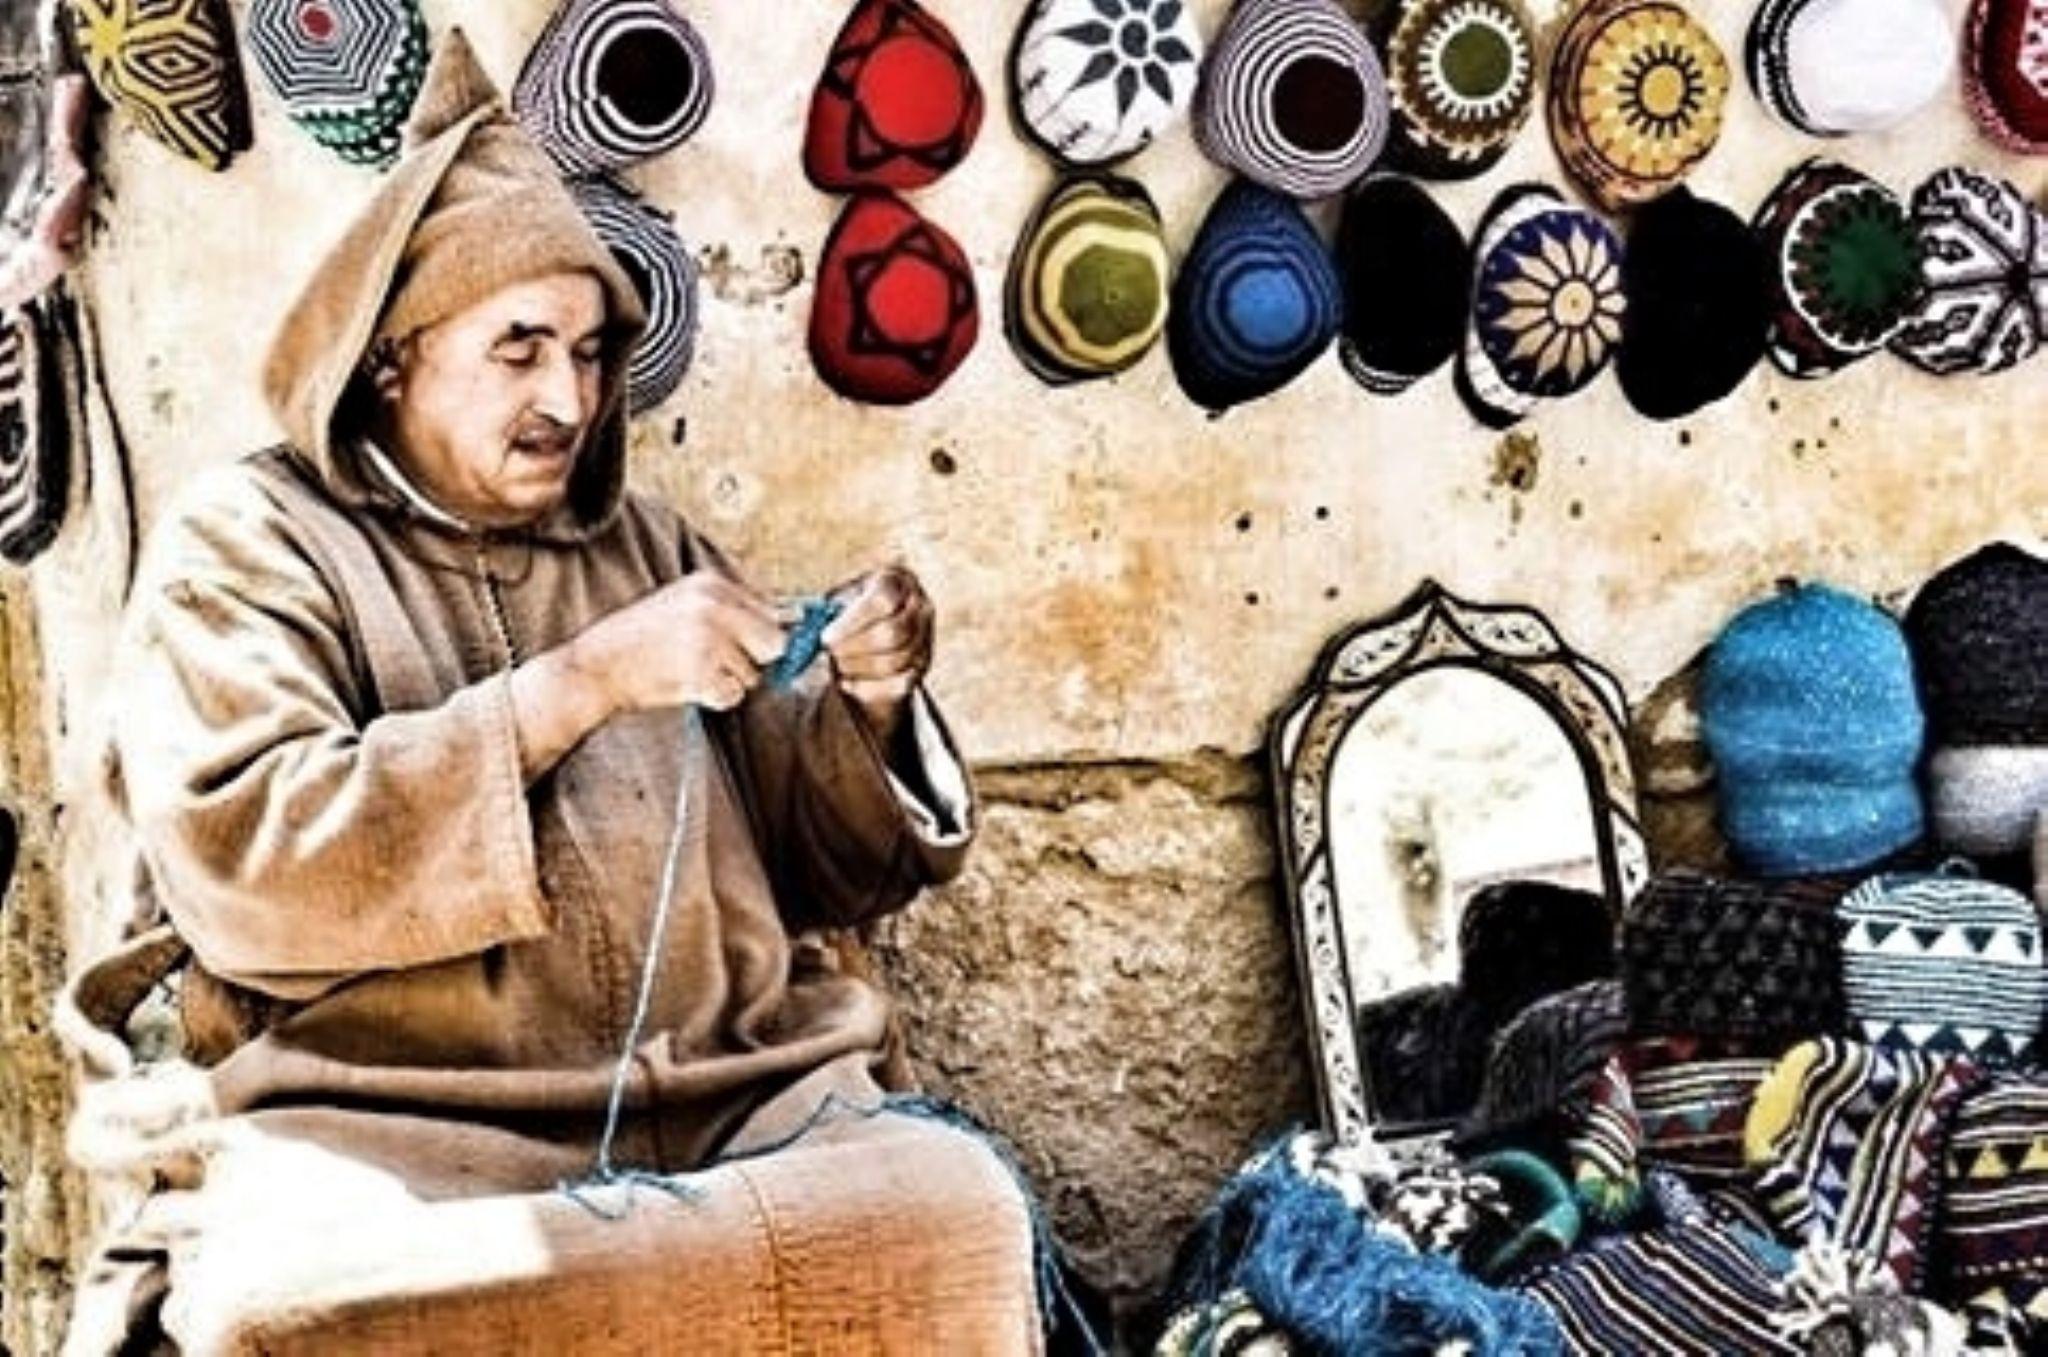 Hombres que tejen en Marruecos by juanalopez